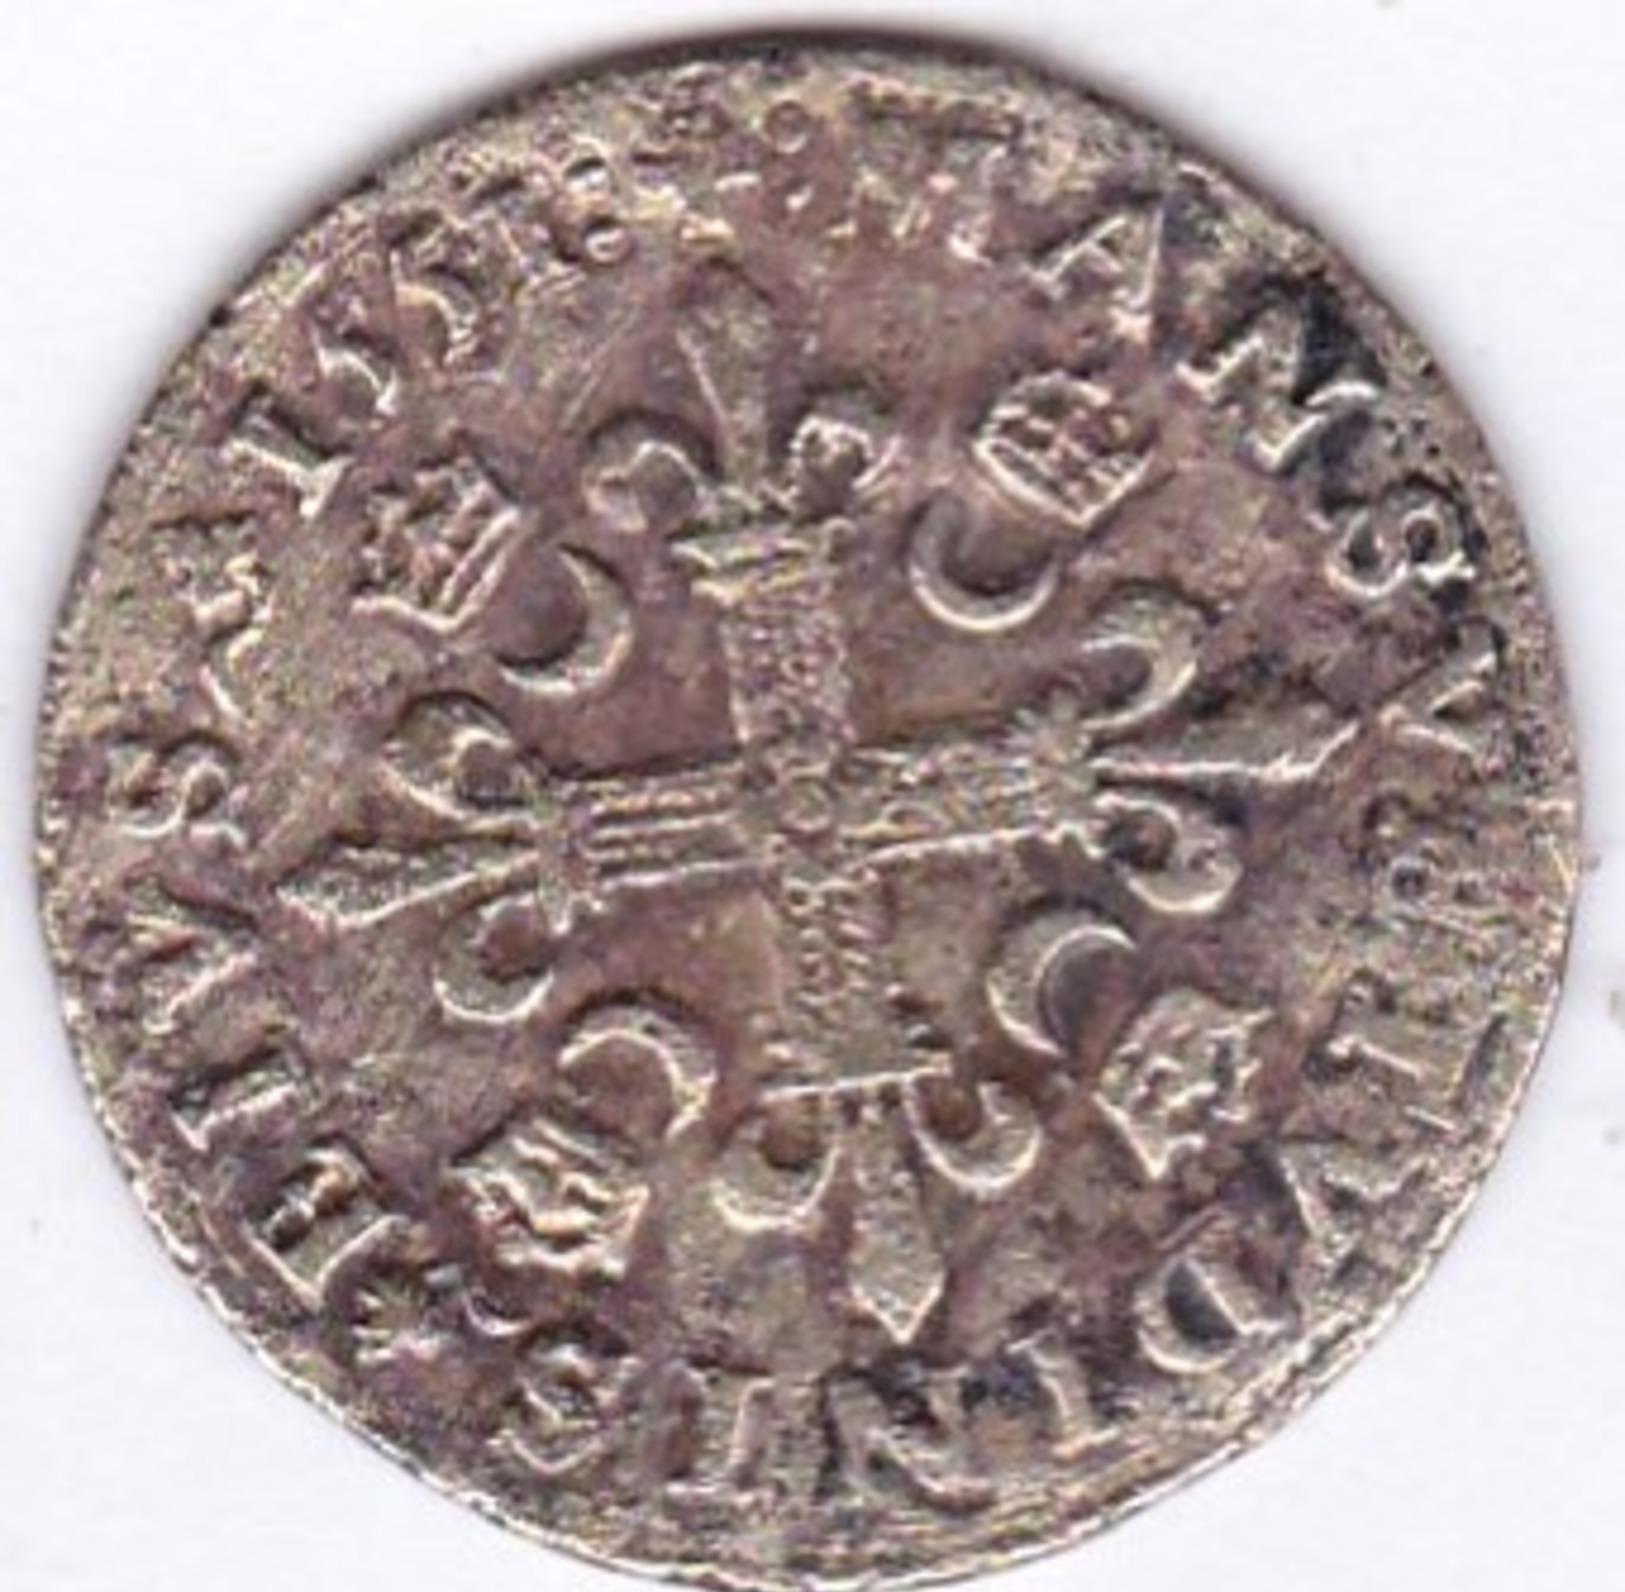 JETON  DOUZAIN  HENRI  II  155?  .   (  2  SCANS  R°V°)  ) . - 987-1789 Royal